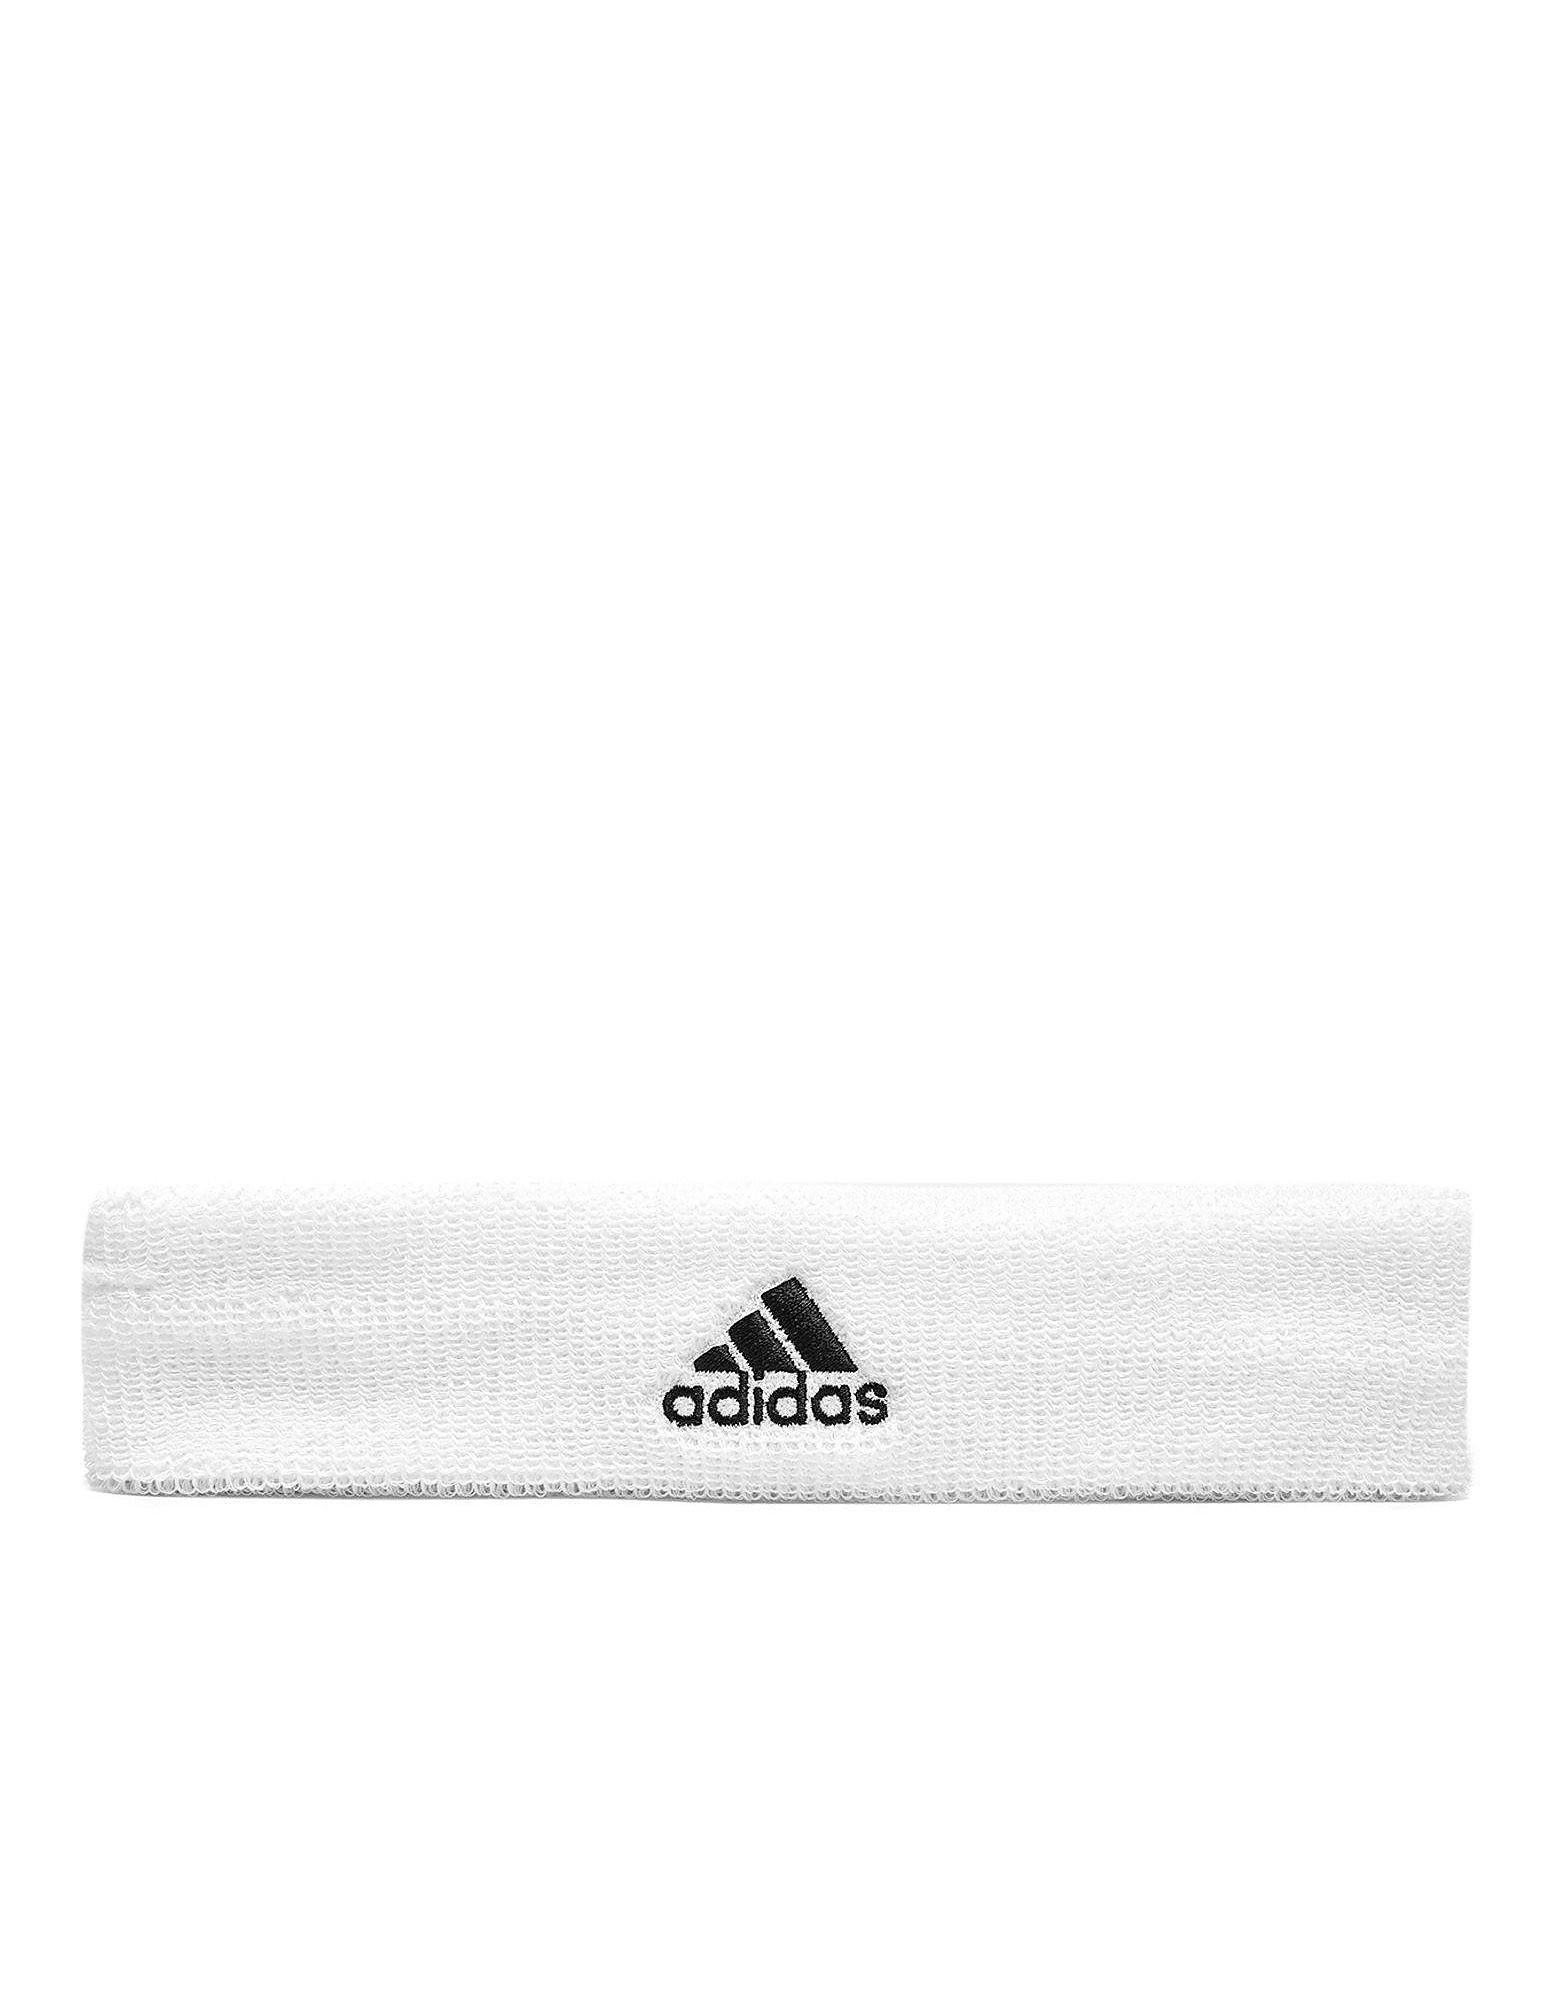 adidas Tennis Headband